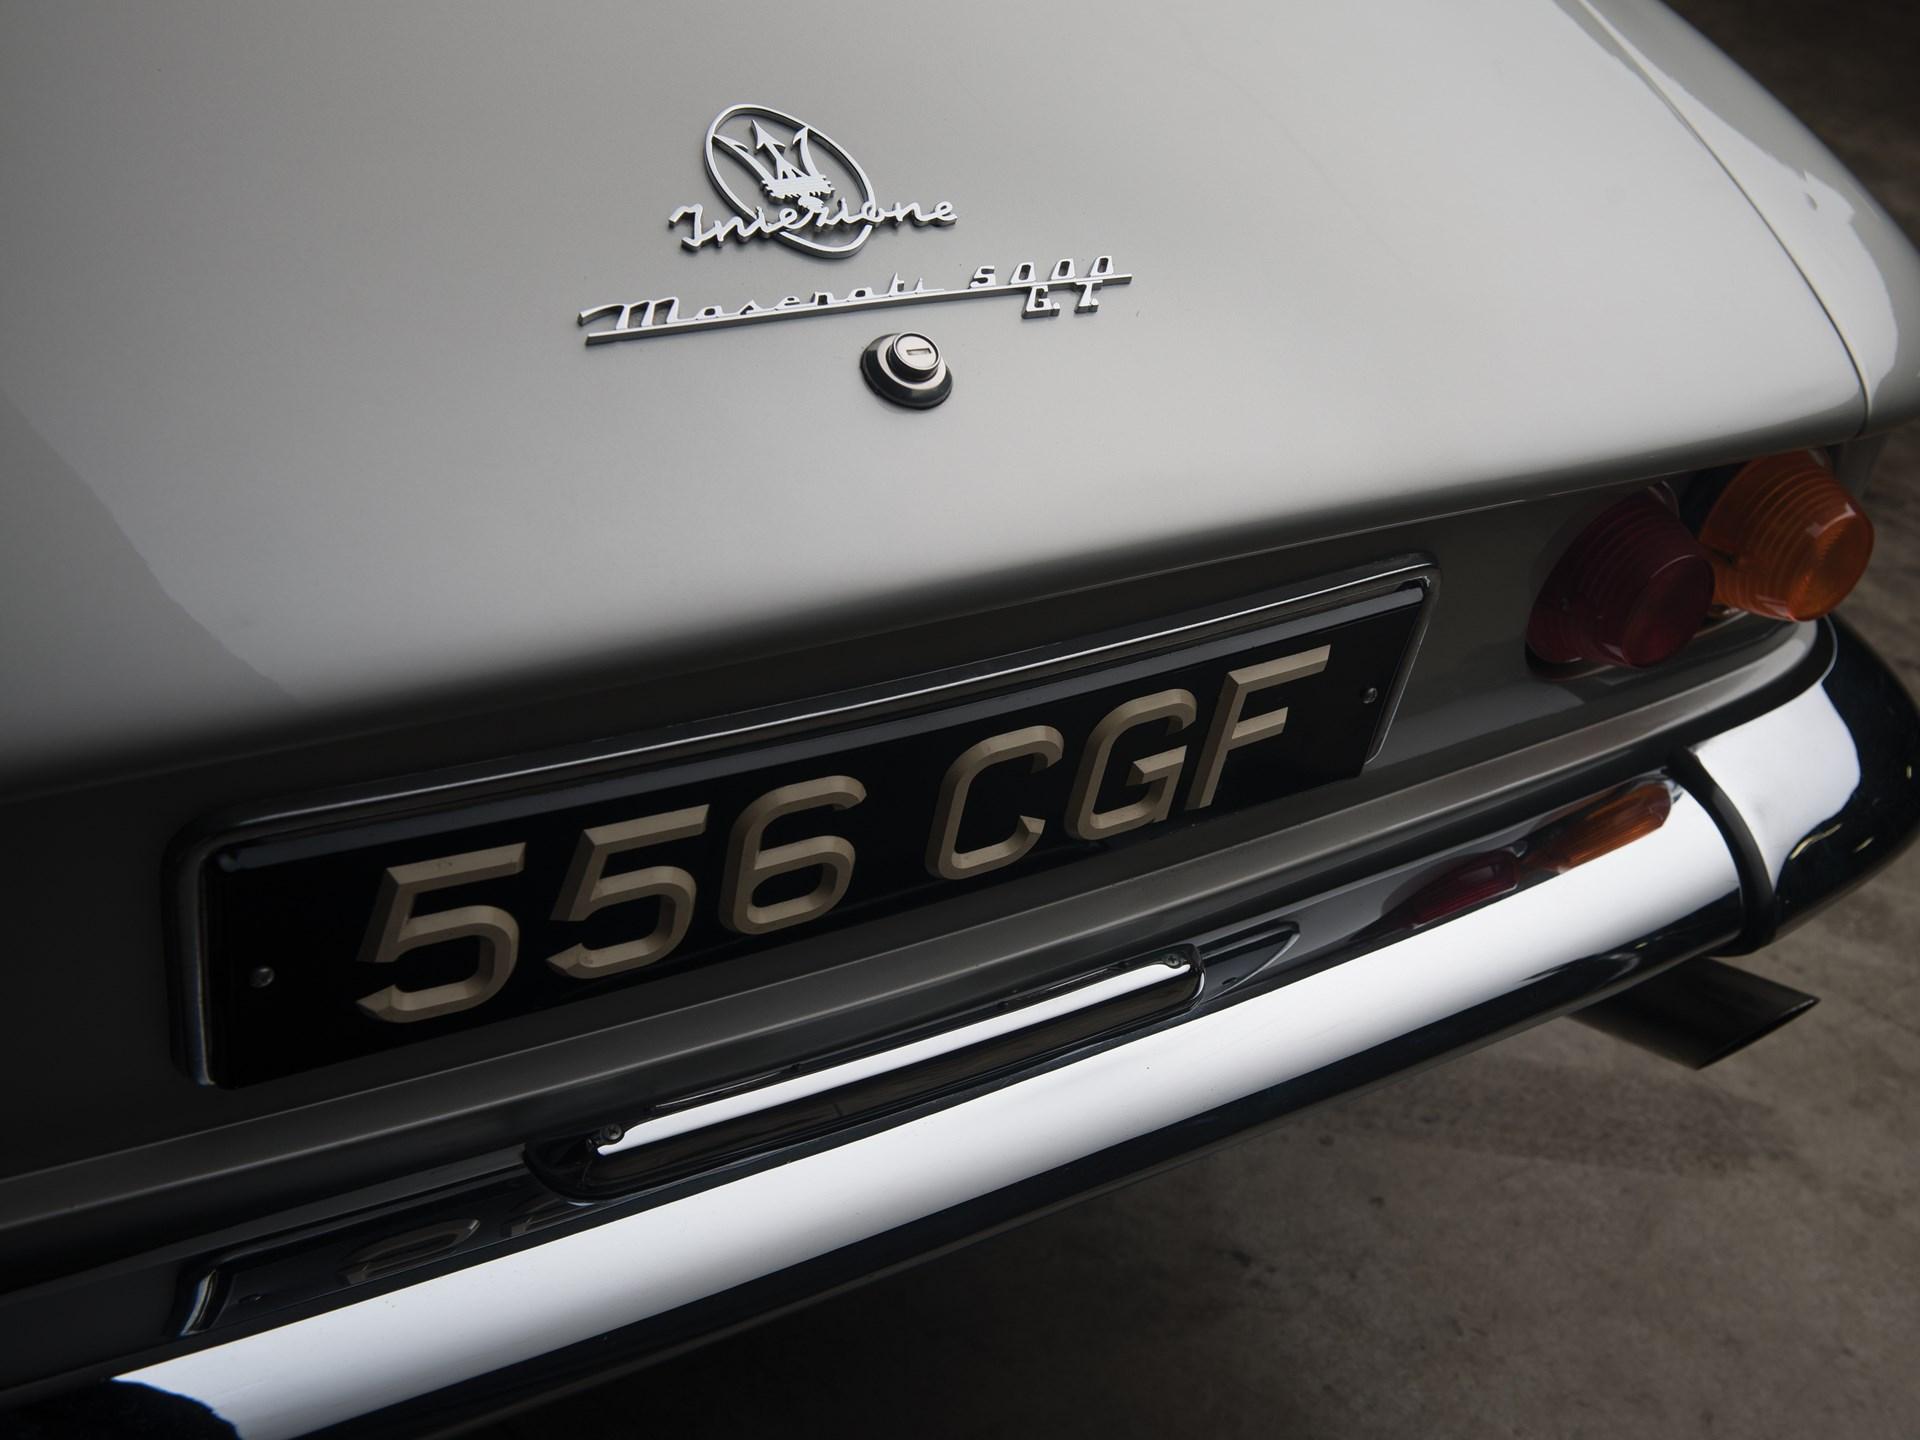 1964 Maserati 5000 GT Coupe by Michelotti